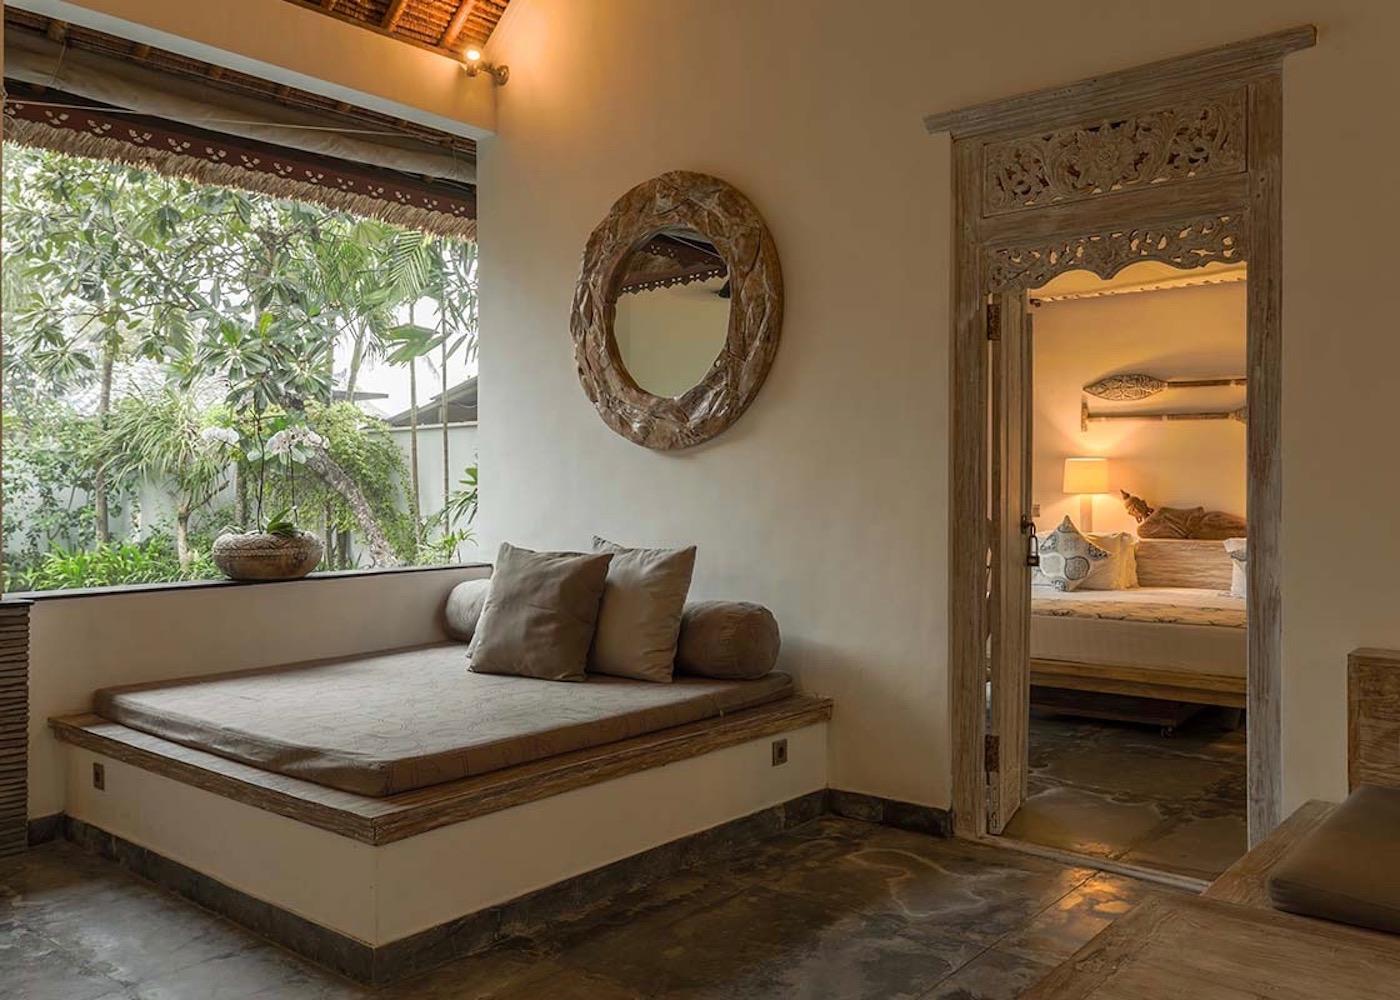 Indiana Kenanga Villas on Nusa Lembongan island in Bali, Indonesia